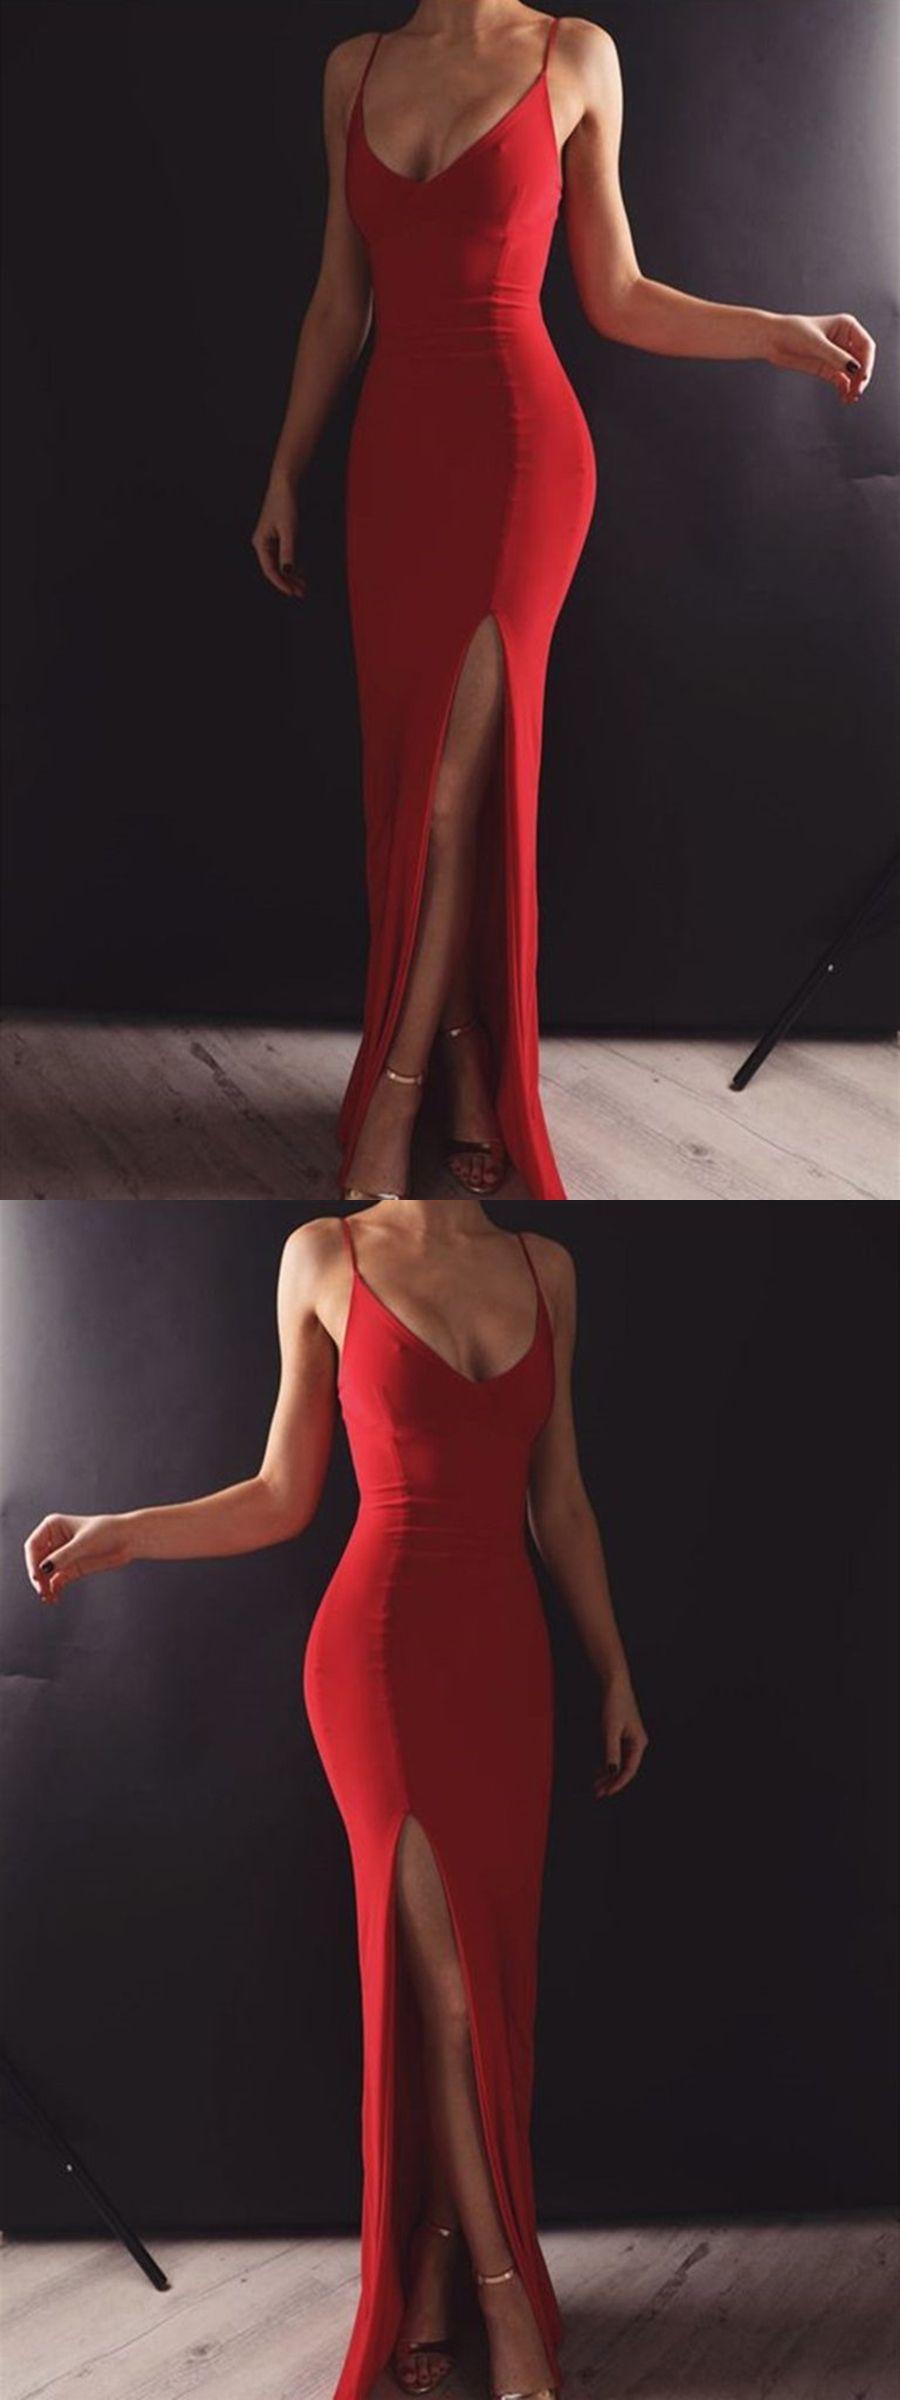 Custom Made Red Mermaid Long Prom Dresses with Leg Slit, Mermaid Red Formal Dresses, Red Evening Dresses #promdresses #promdress #promdresseslong #promdresses2019 #graduationdresses #eveningdresses #formaldresses #mermaidpromdress #redpromdress #slitpromdress